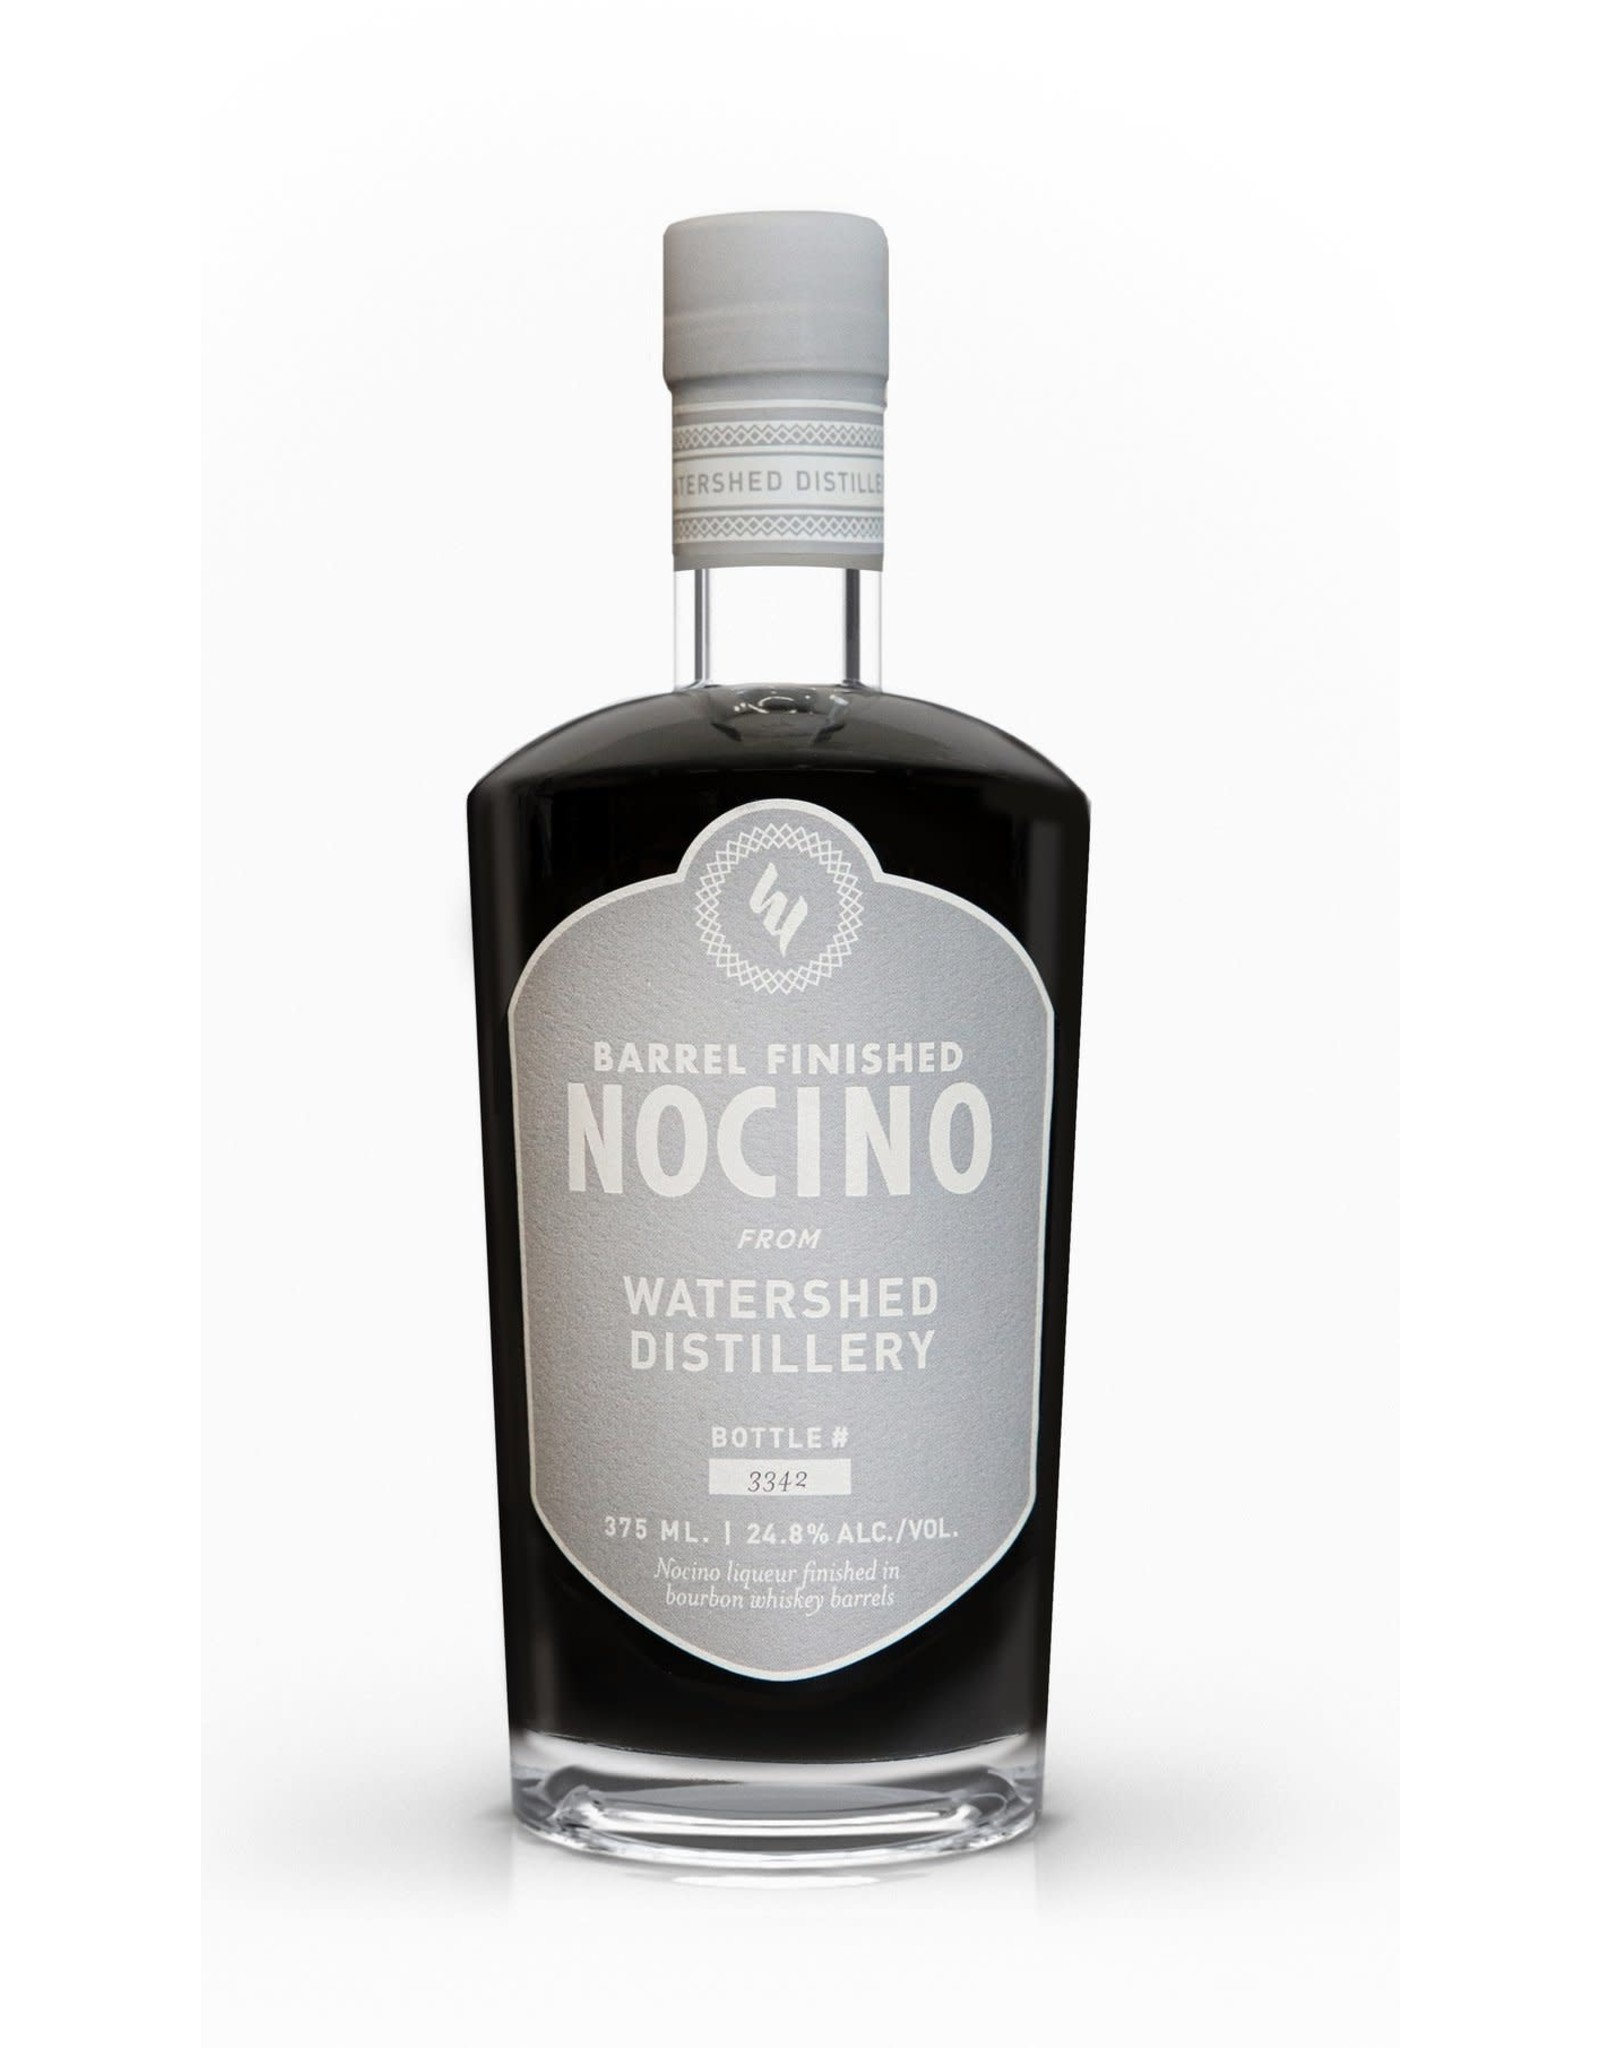 Watershed Distillery Barrel Finished Nocino